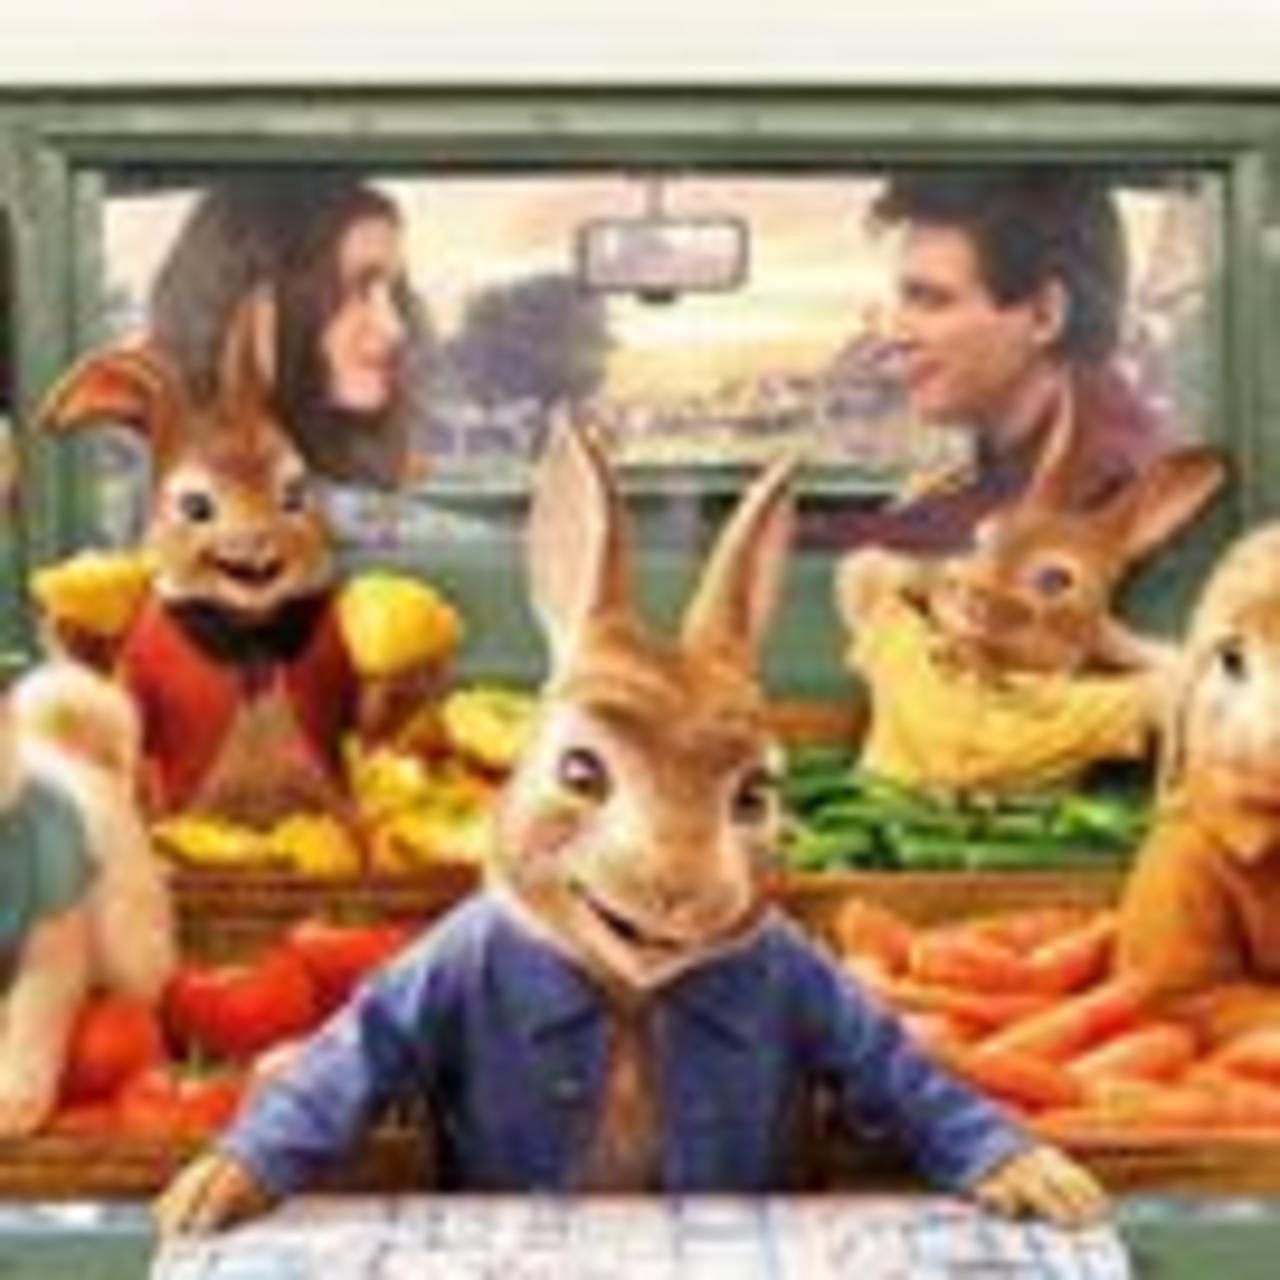 Peter Rabbit 2: The Runaway: Video Review